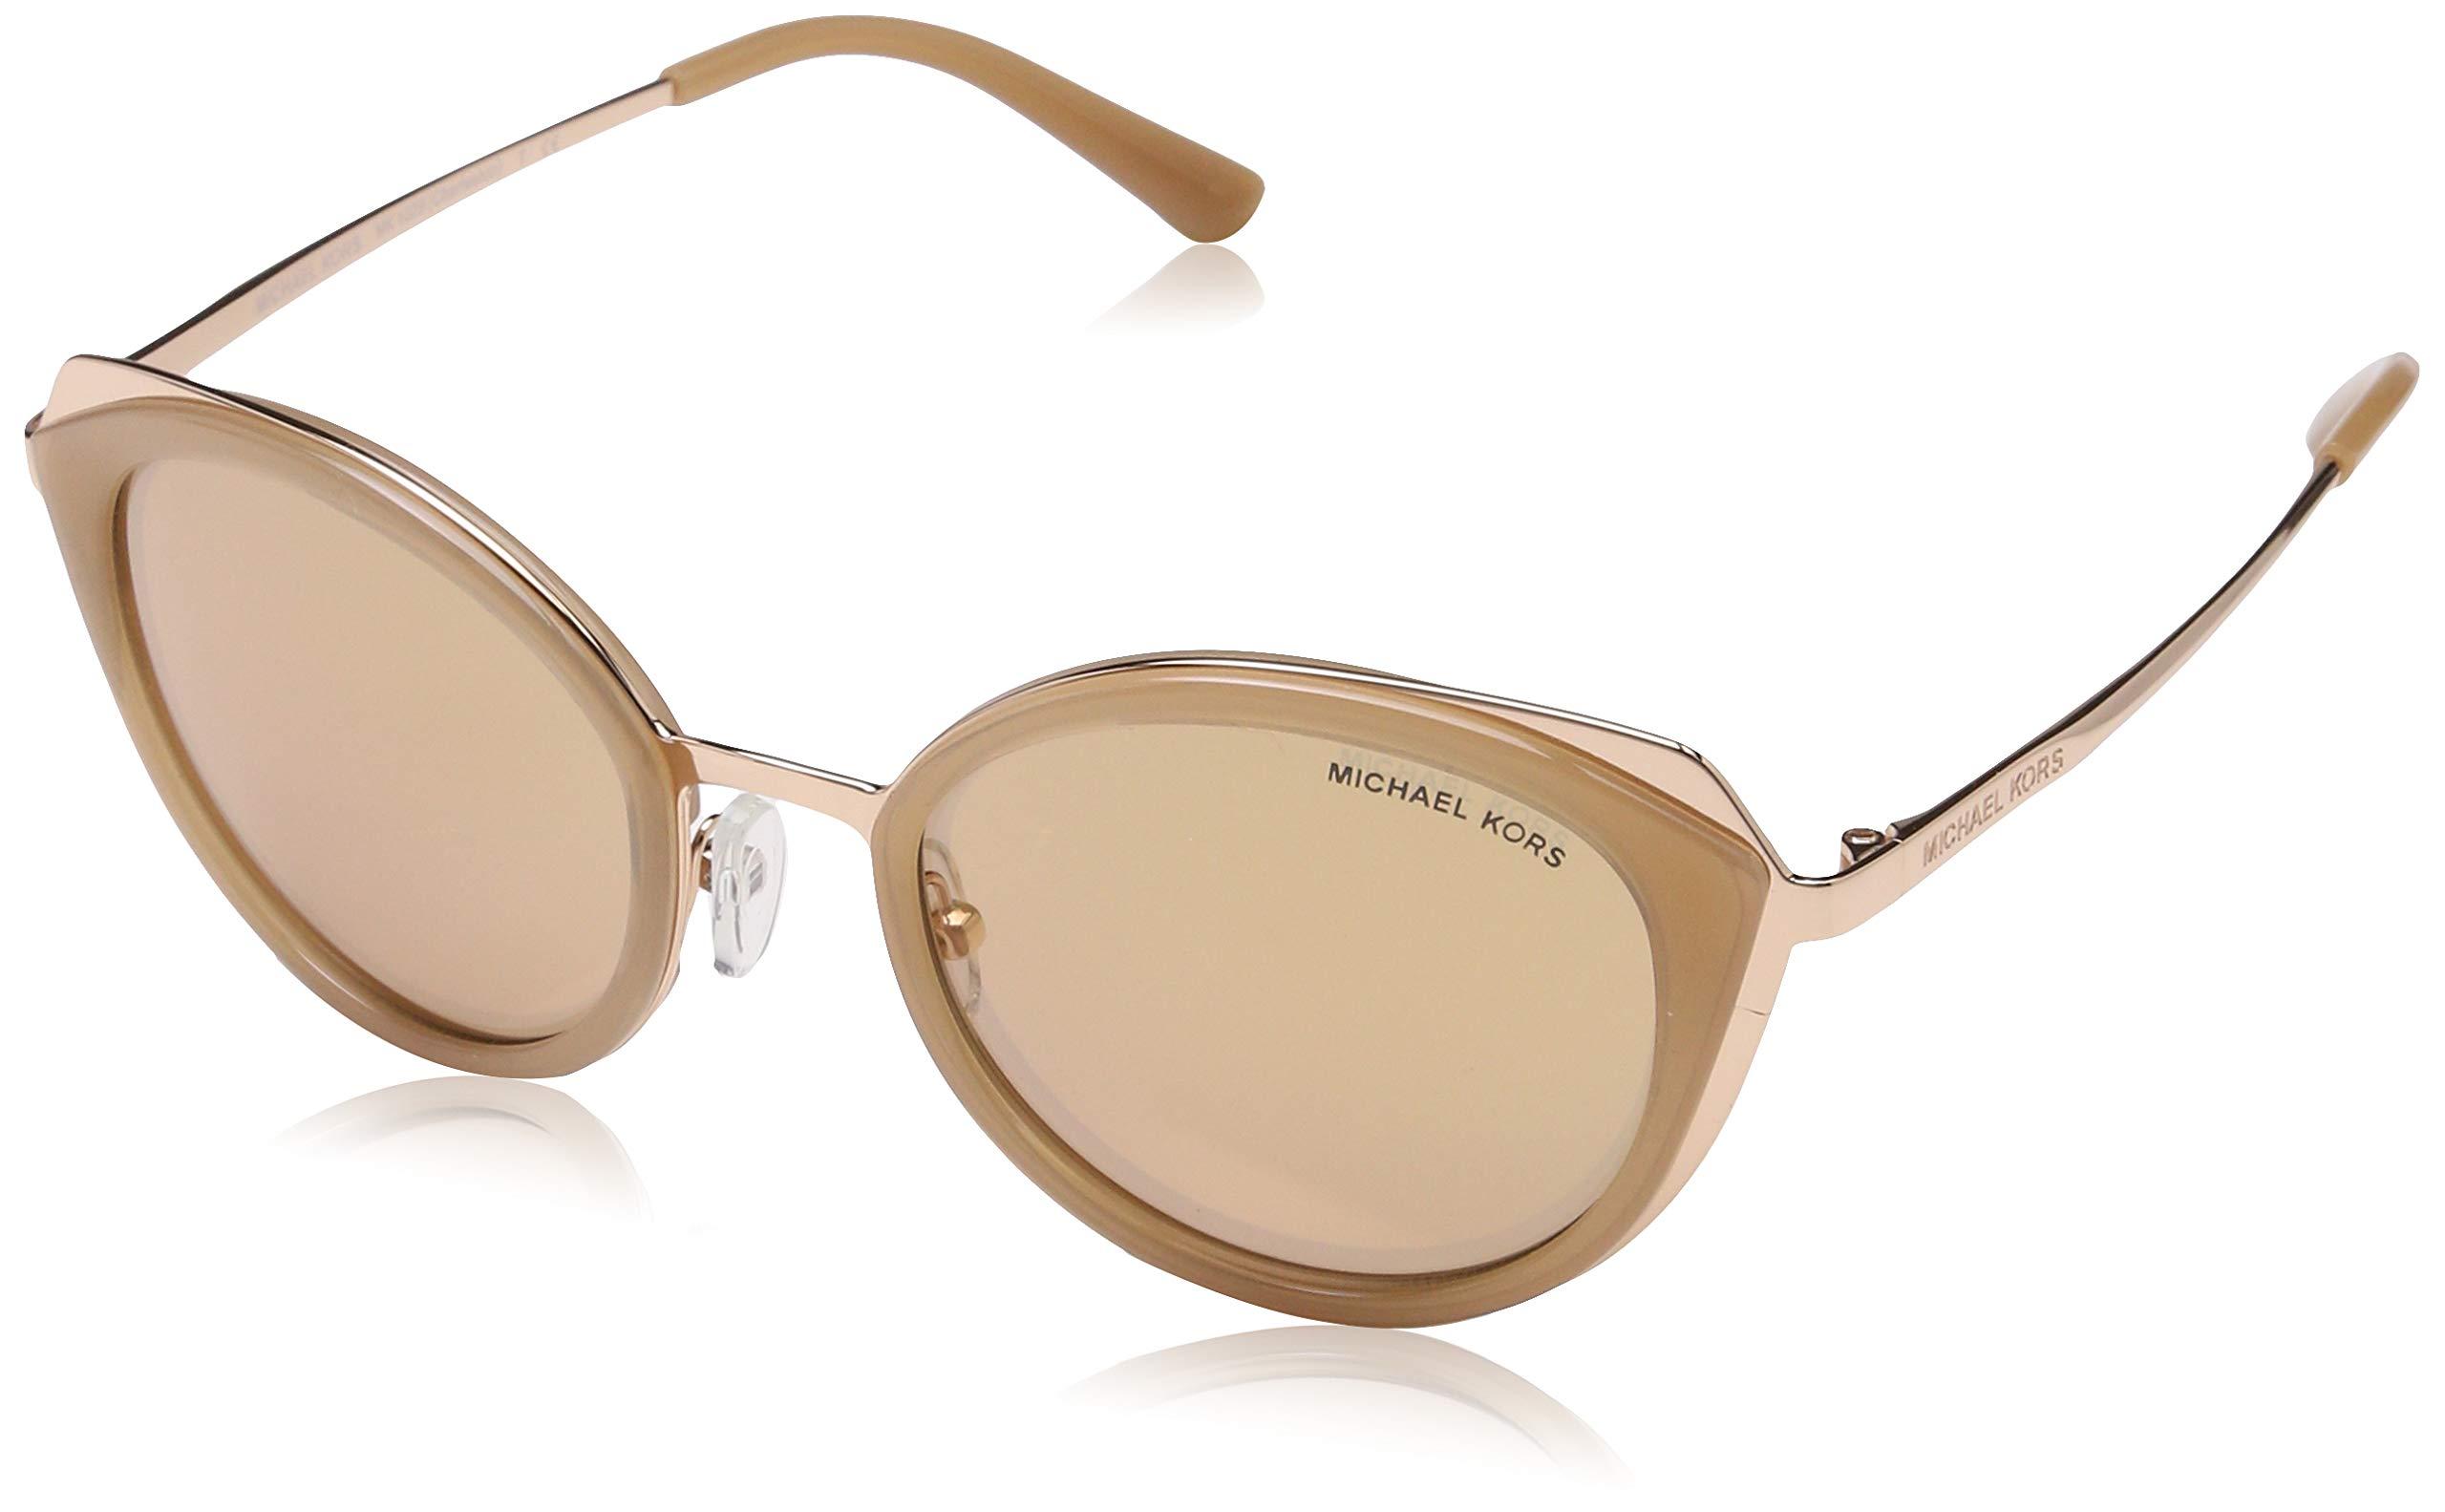 Sunglasses Michael Kors MK 1029 1026R1 ROSE GOLD/MILKY LT BROWN by Michael Kors